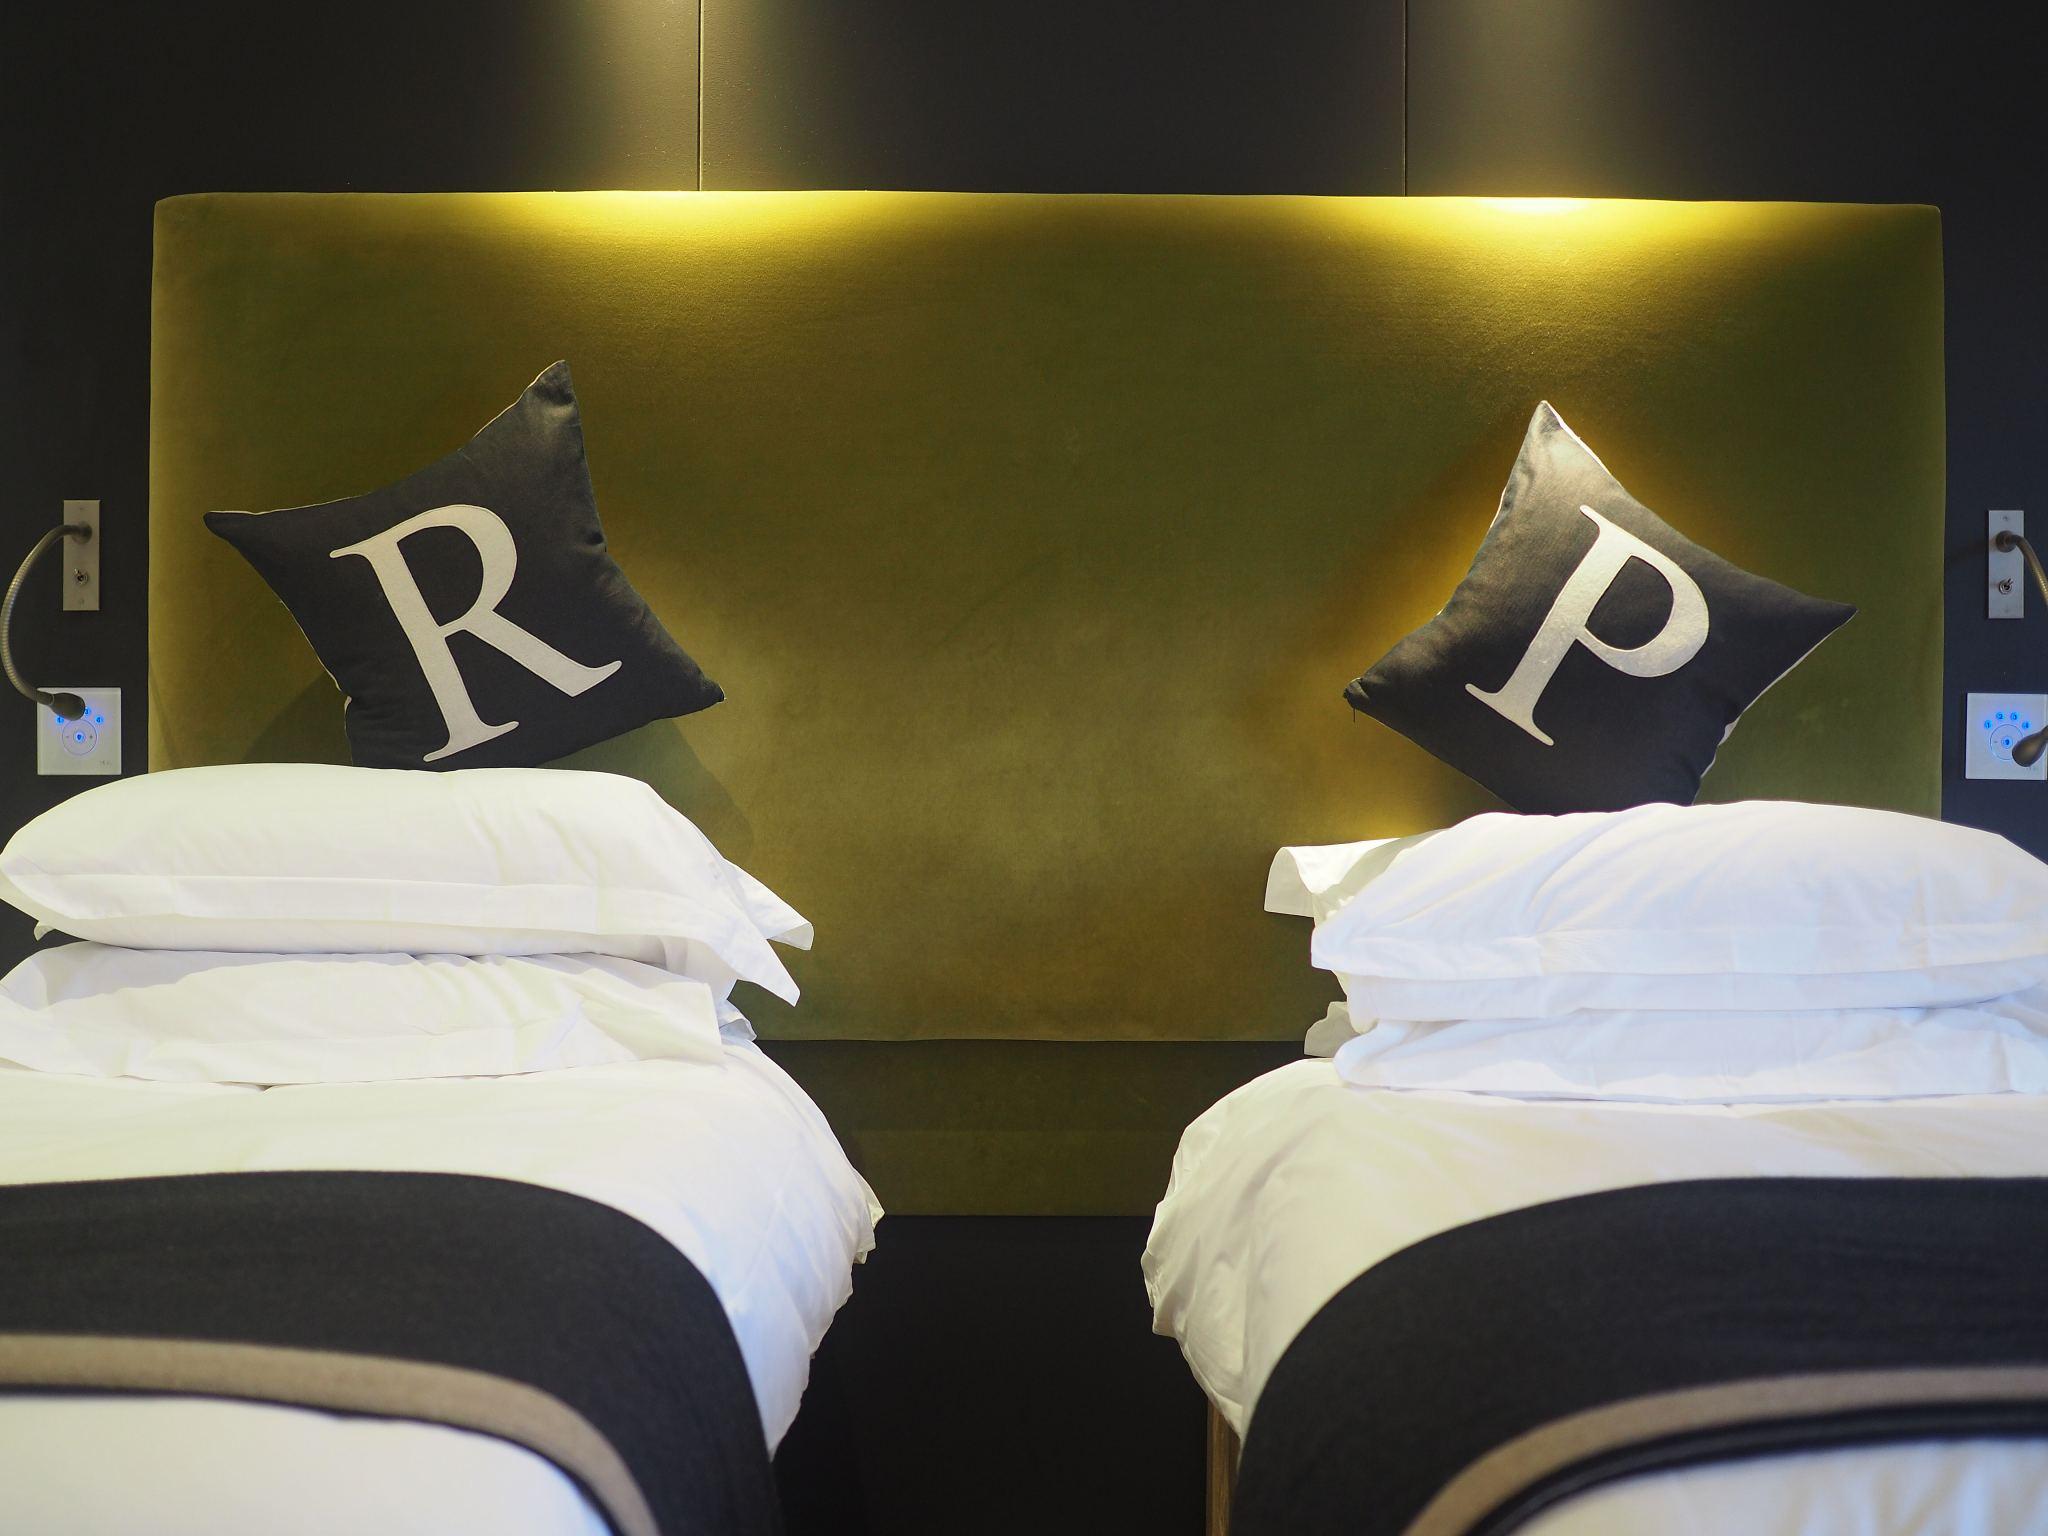 Rudding Park Hotel